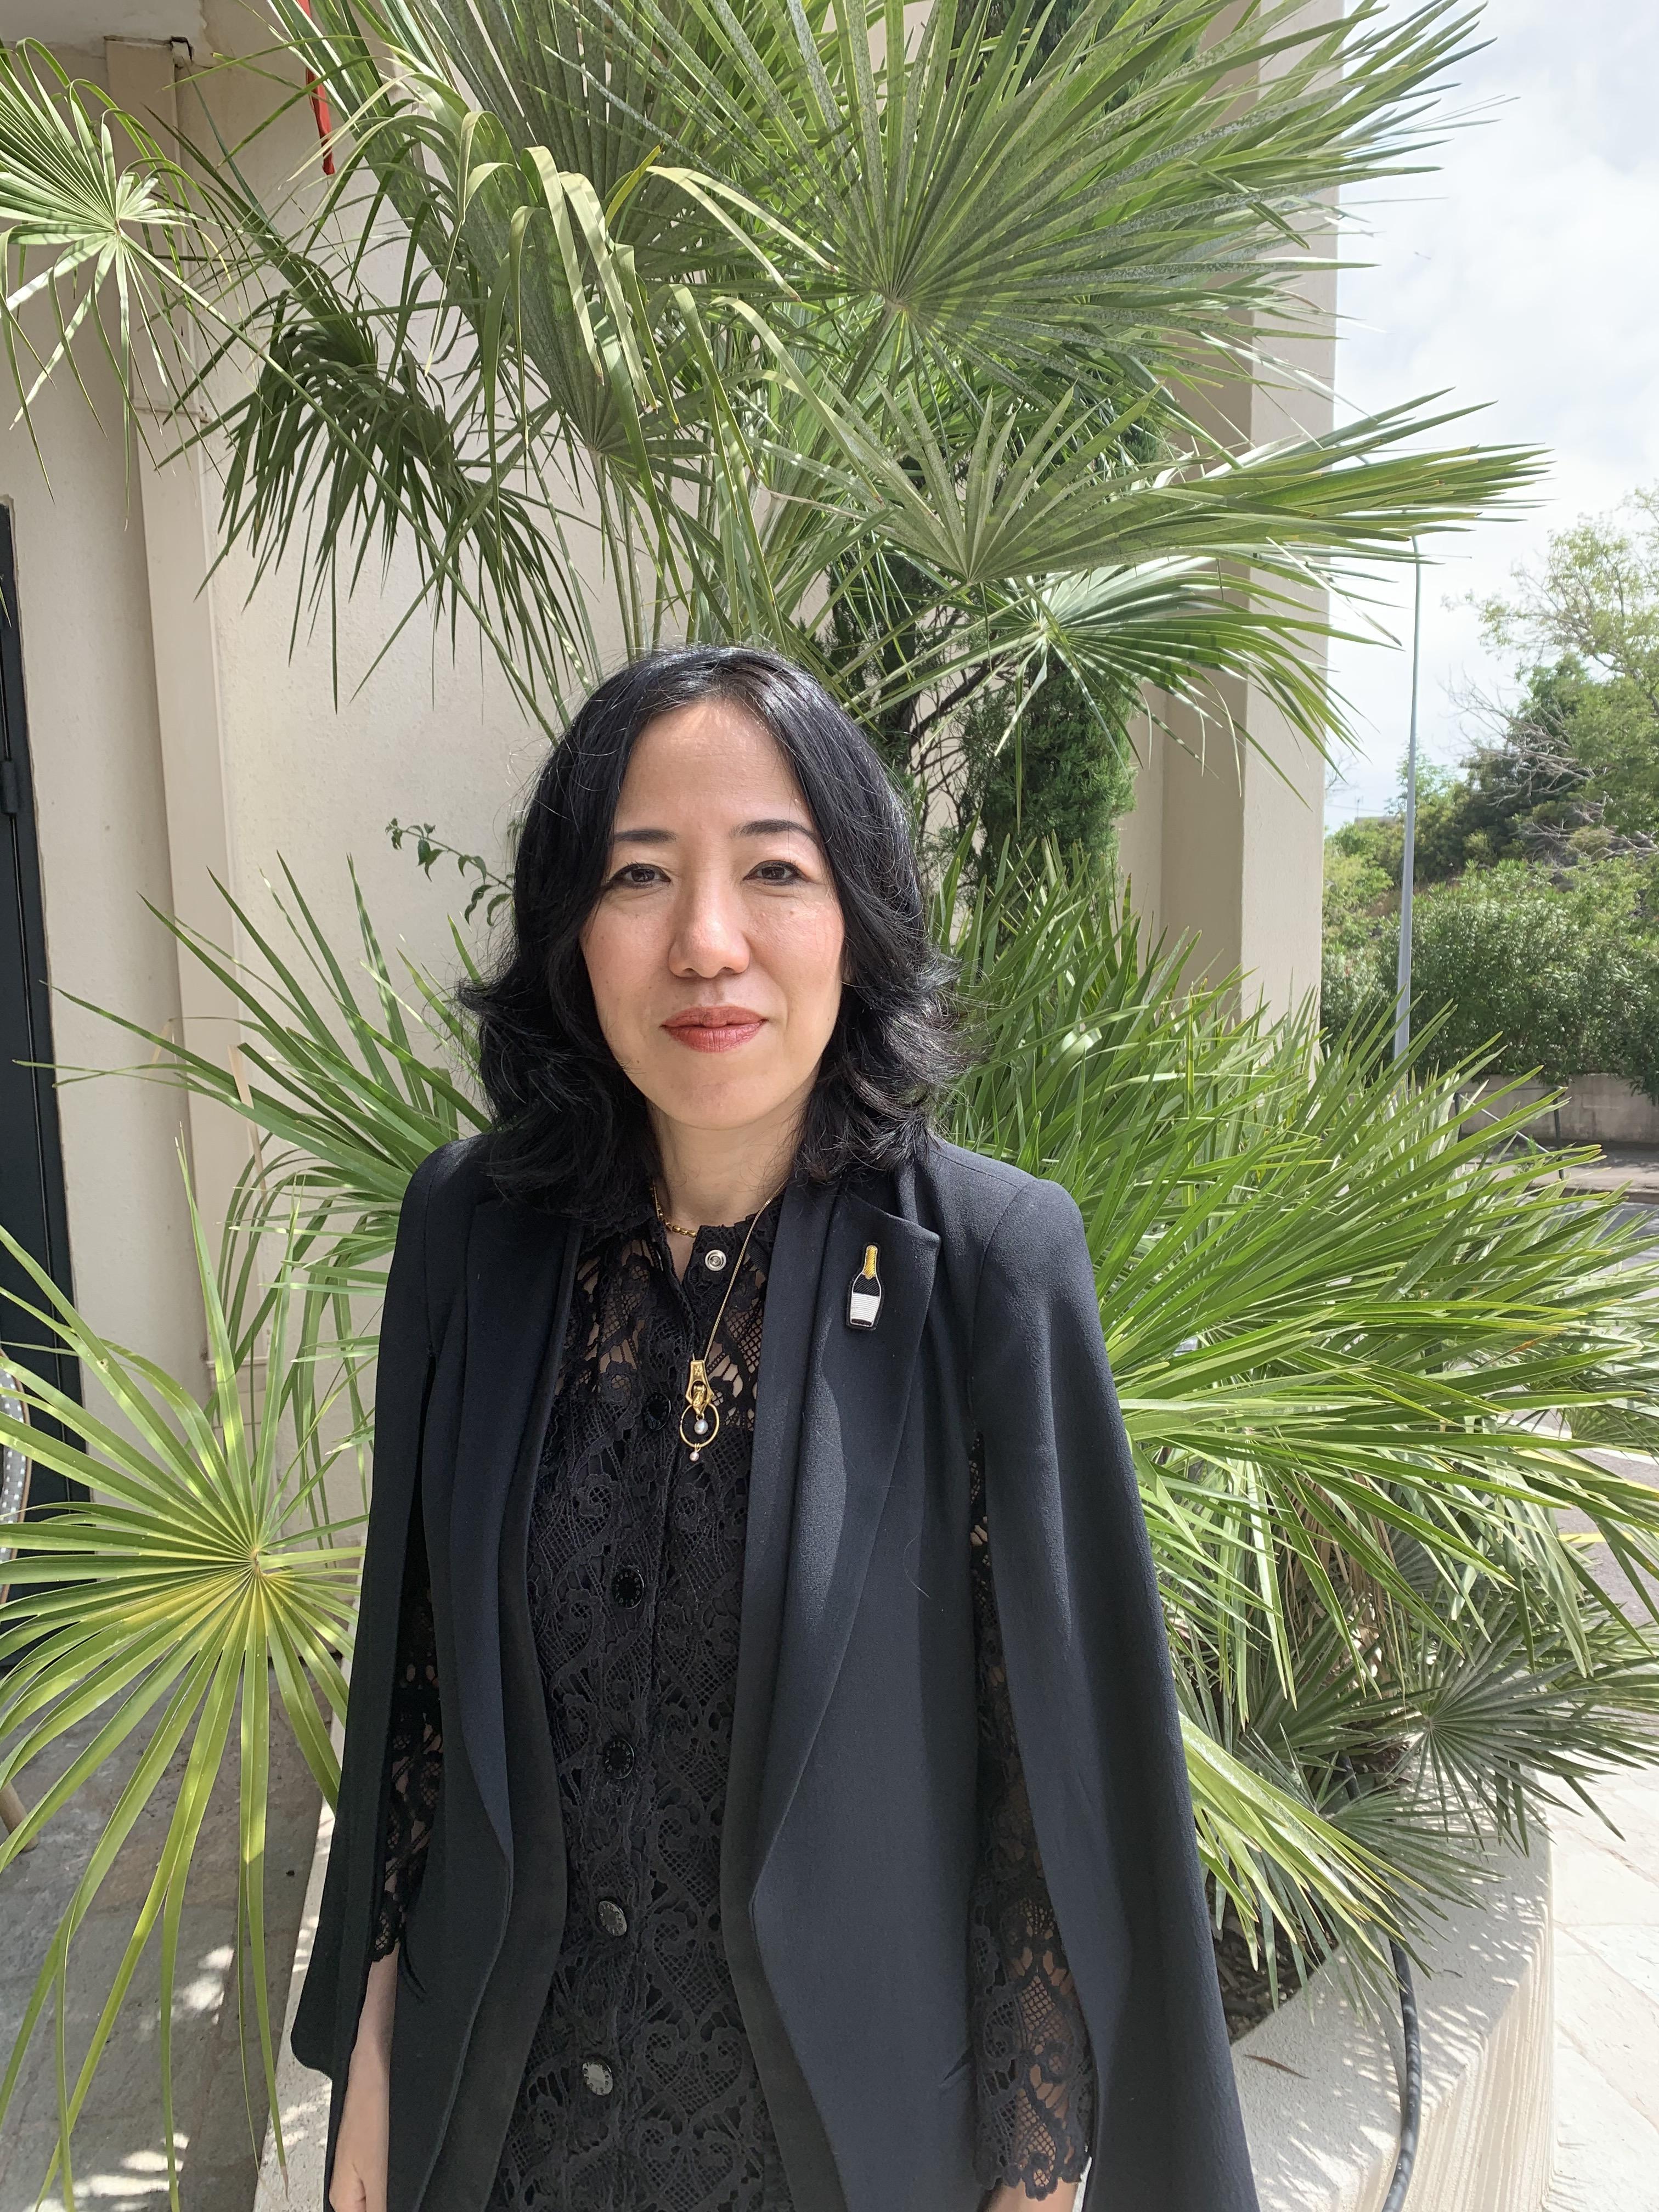 Invitée d'Histoire(s) en Mai, l'auteure Ryoko Sekiguchi